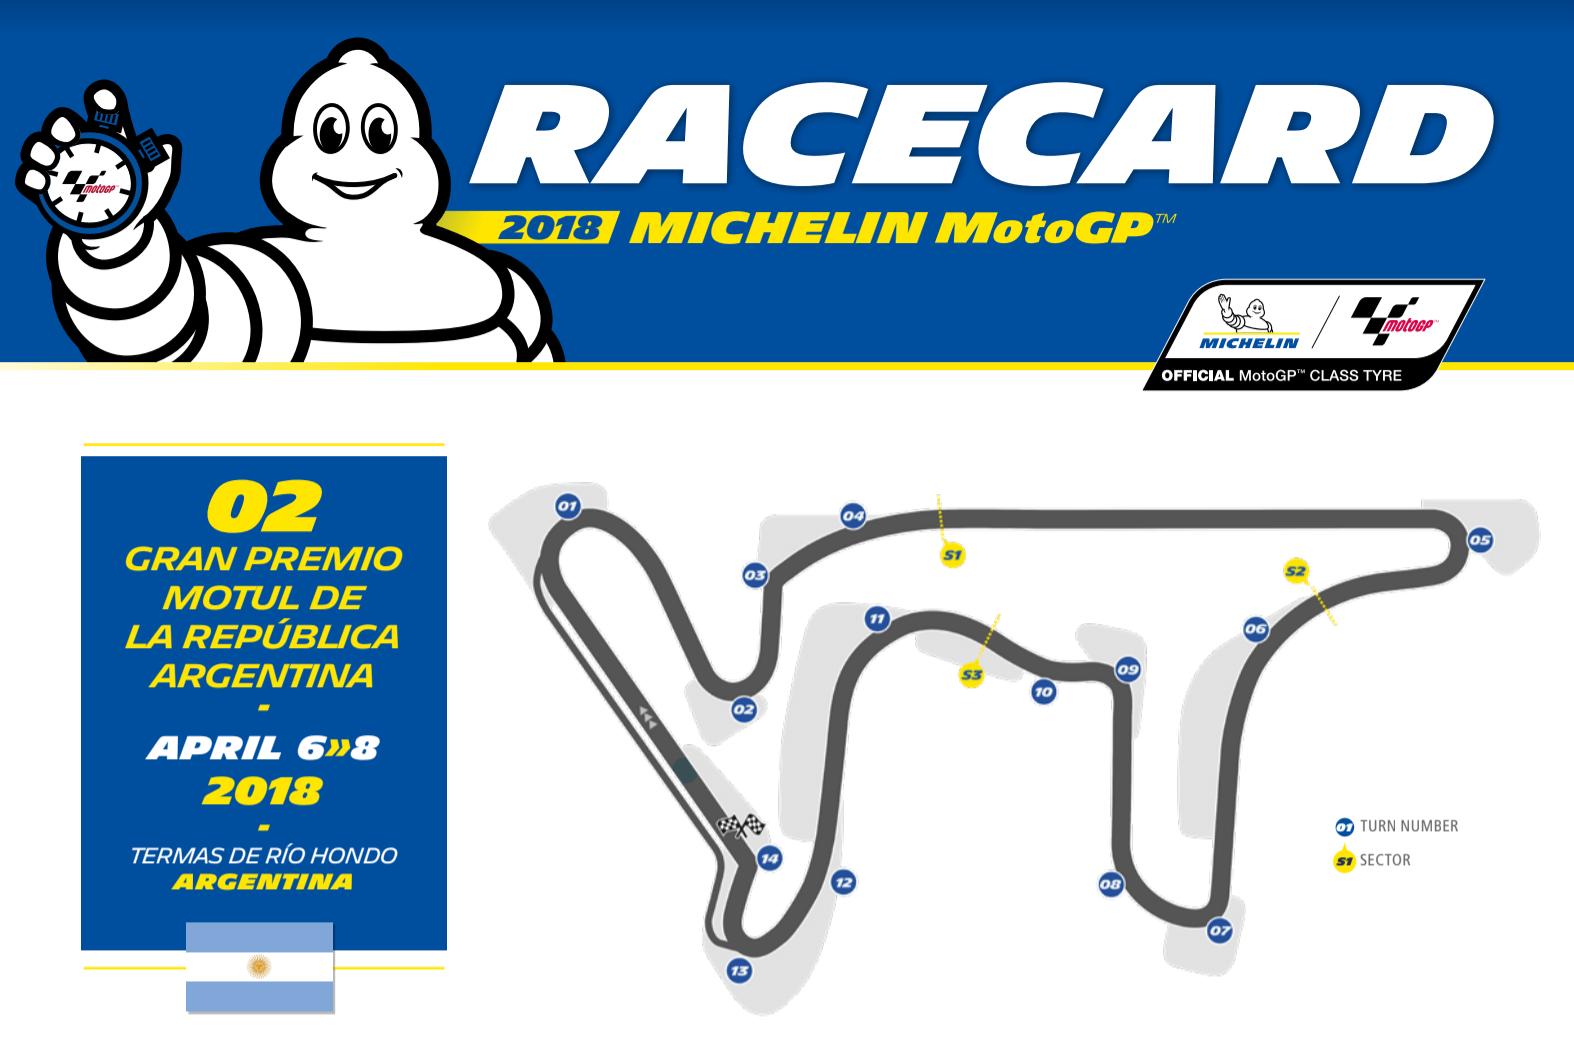 ★MotoGP2018ミシュラン アルゼンチンでのチャレンジに向け南米へ